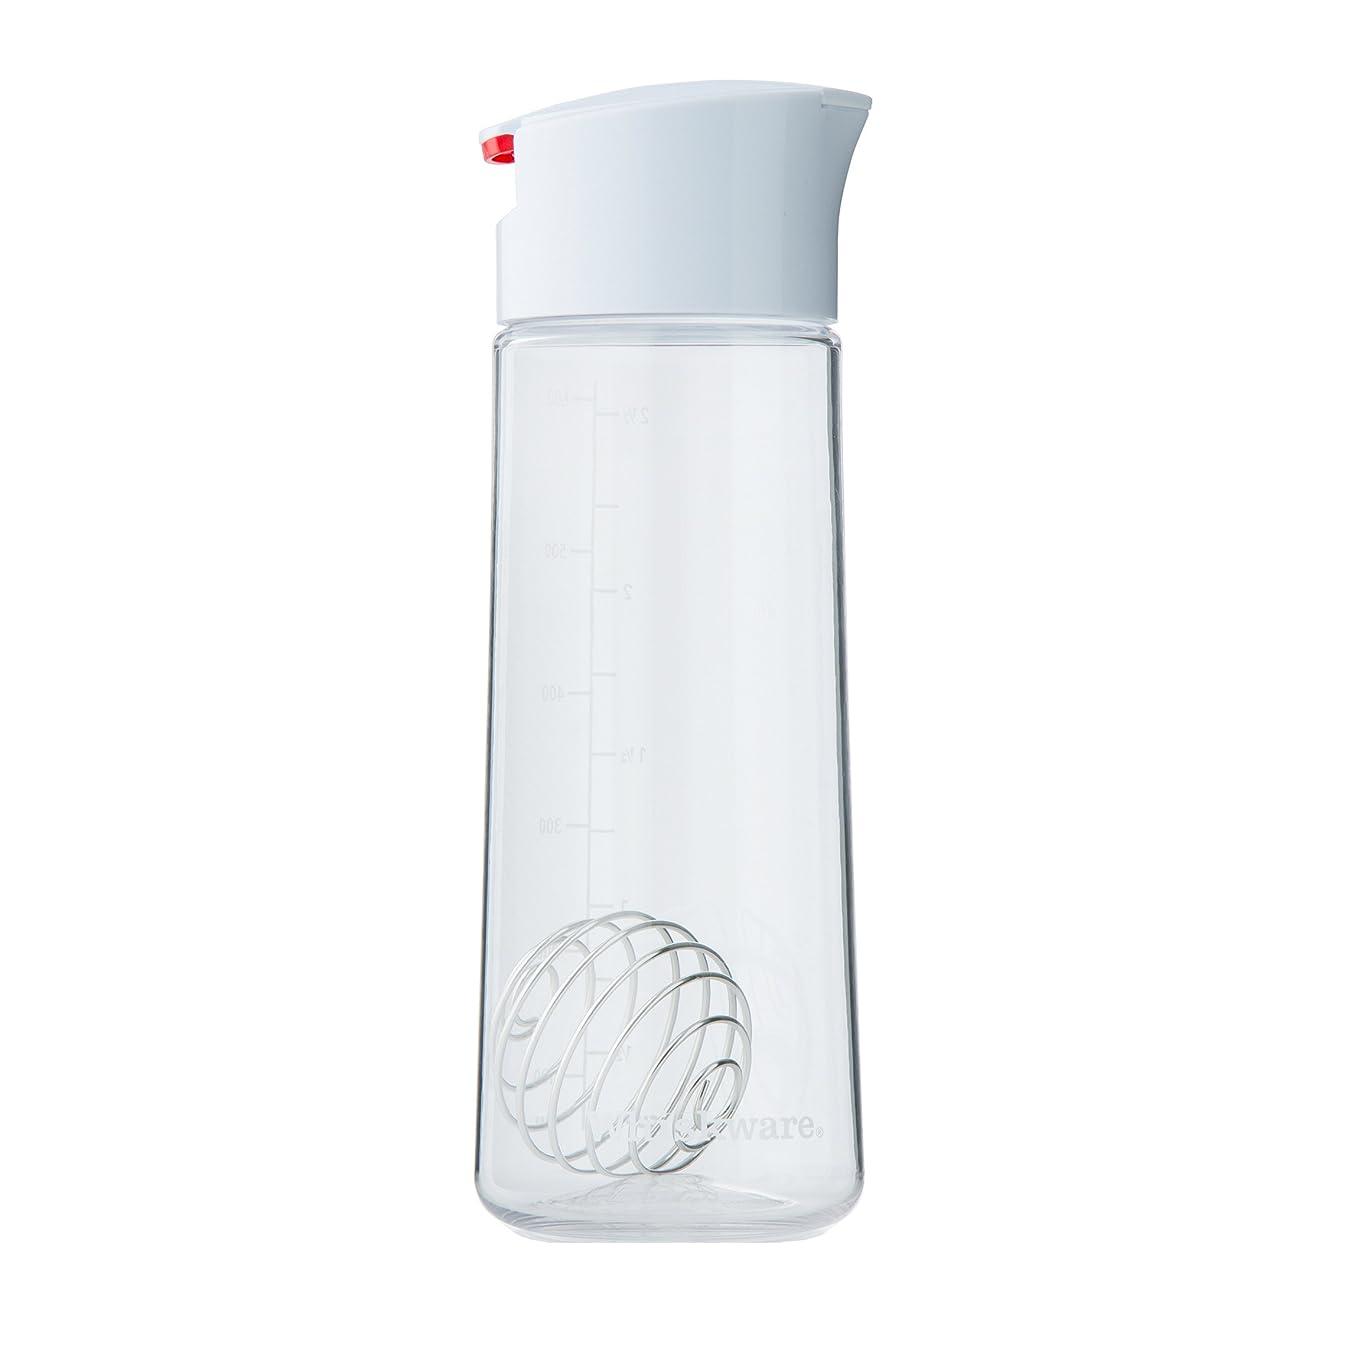 Whiskware Dressing Shaker with BlenderBall Wire Whisk, Tritan - C01396, White